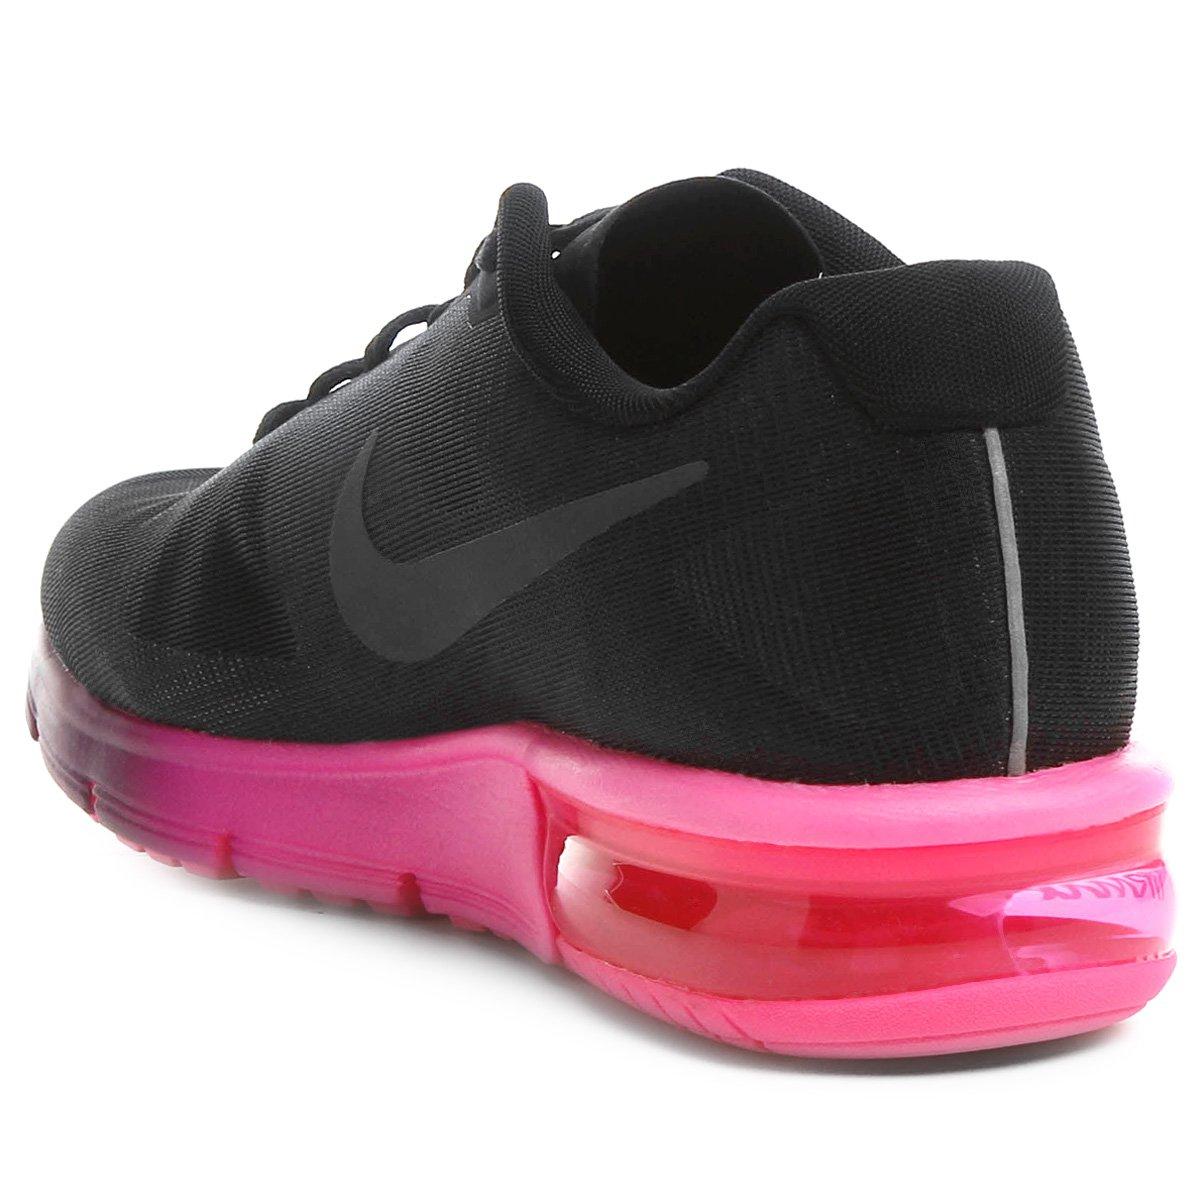 new products 13178 8c0db ... tênis nike air max sequent feminino preto e rosa